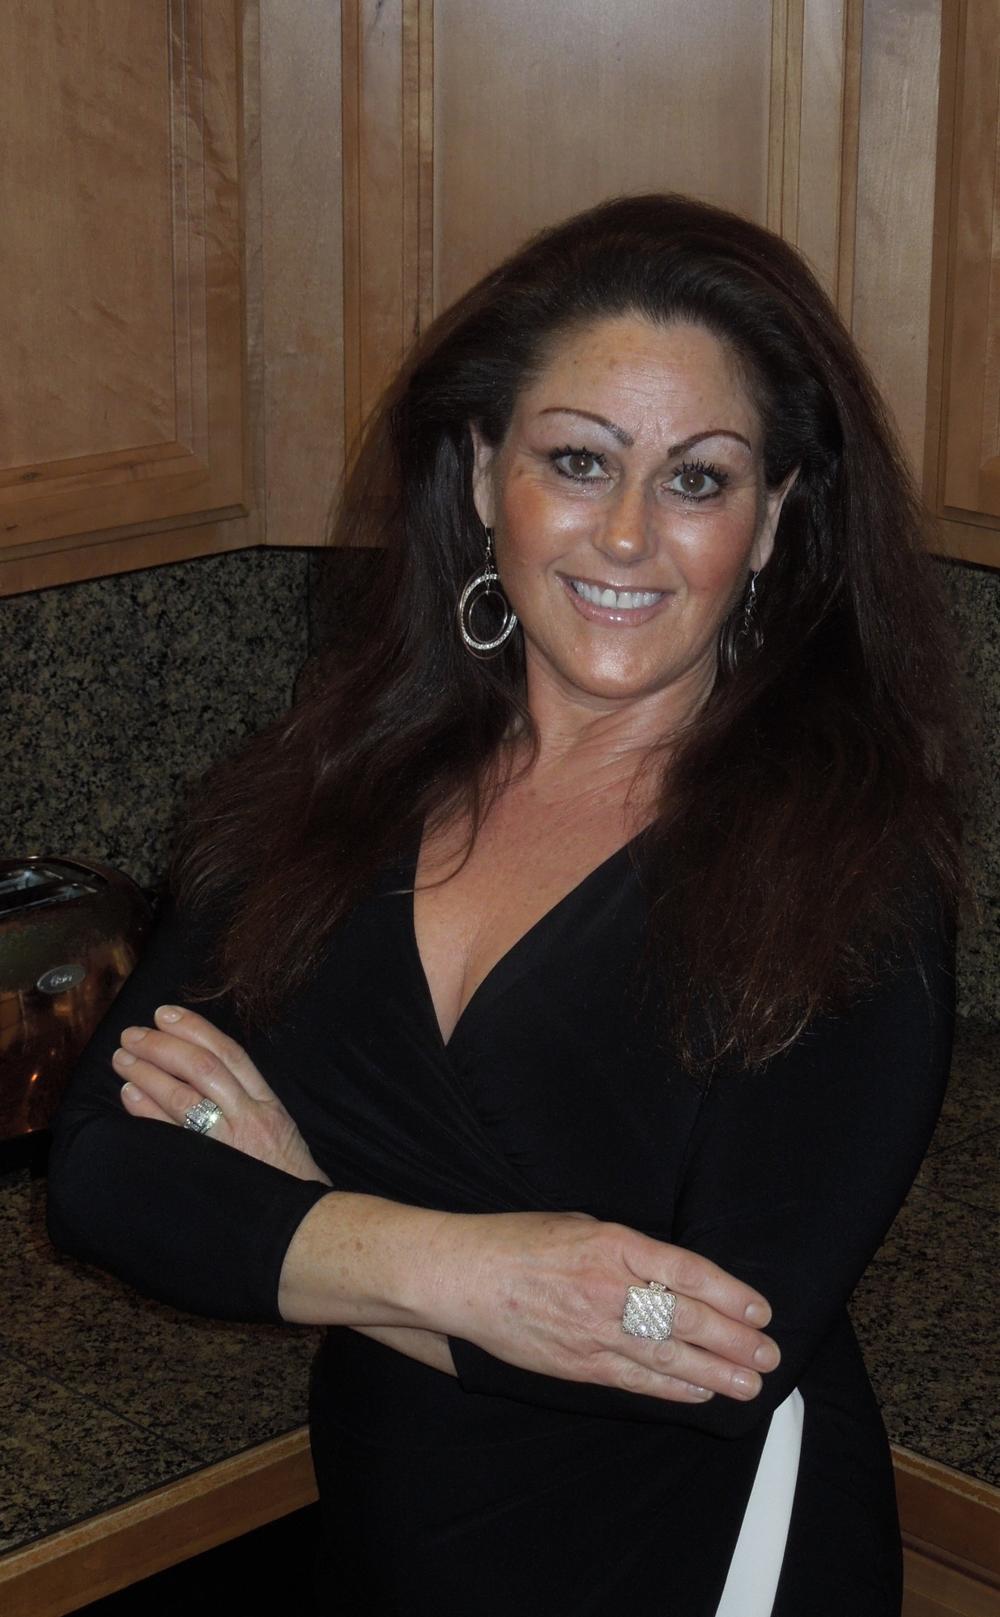 Judith Galindo - Owner